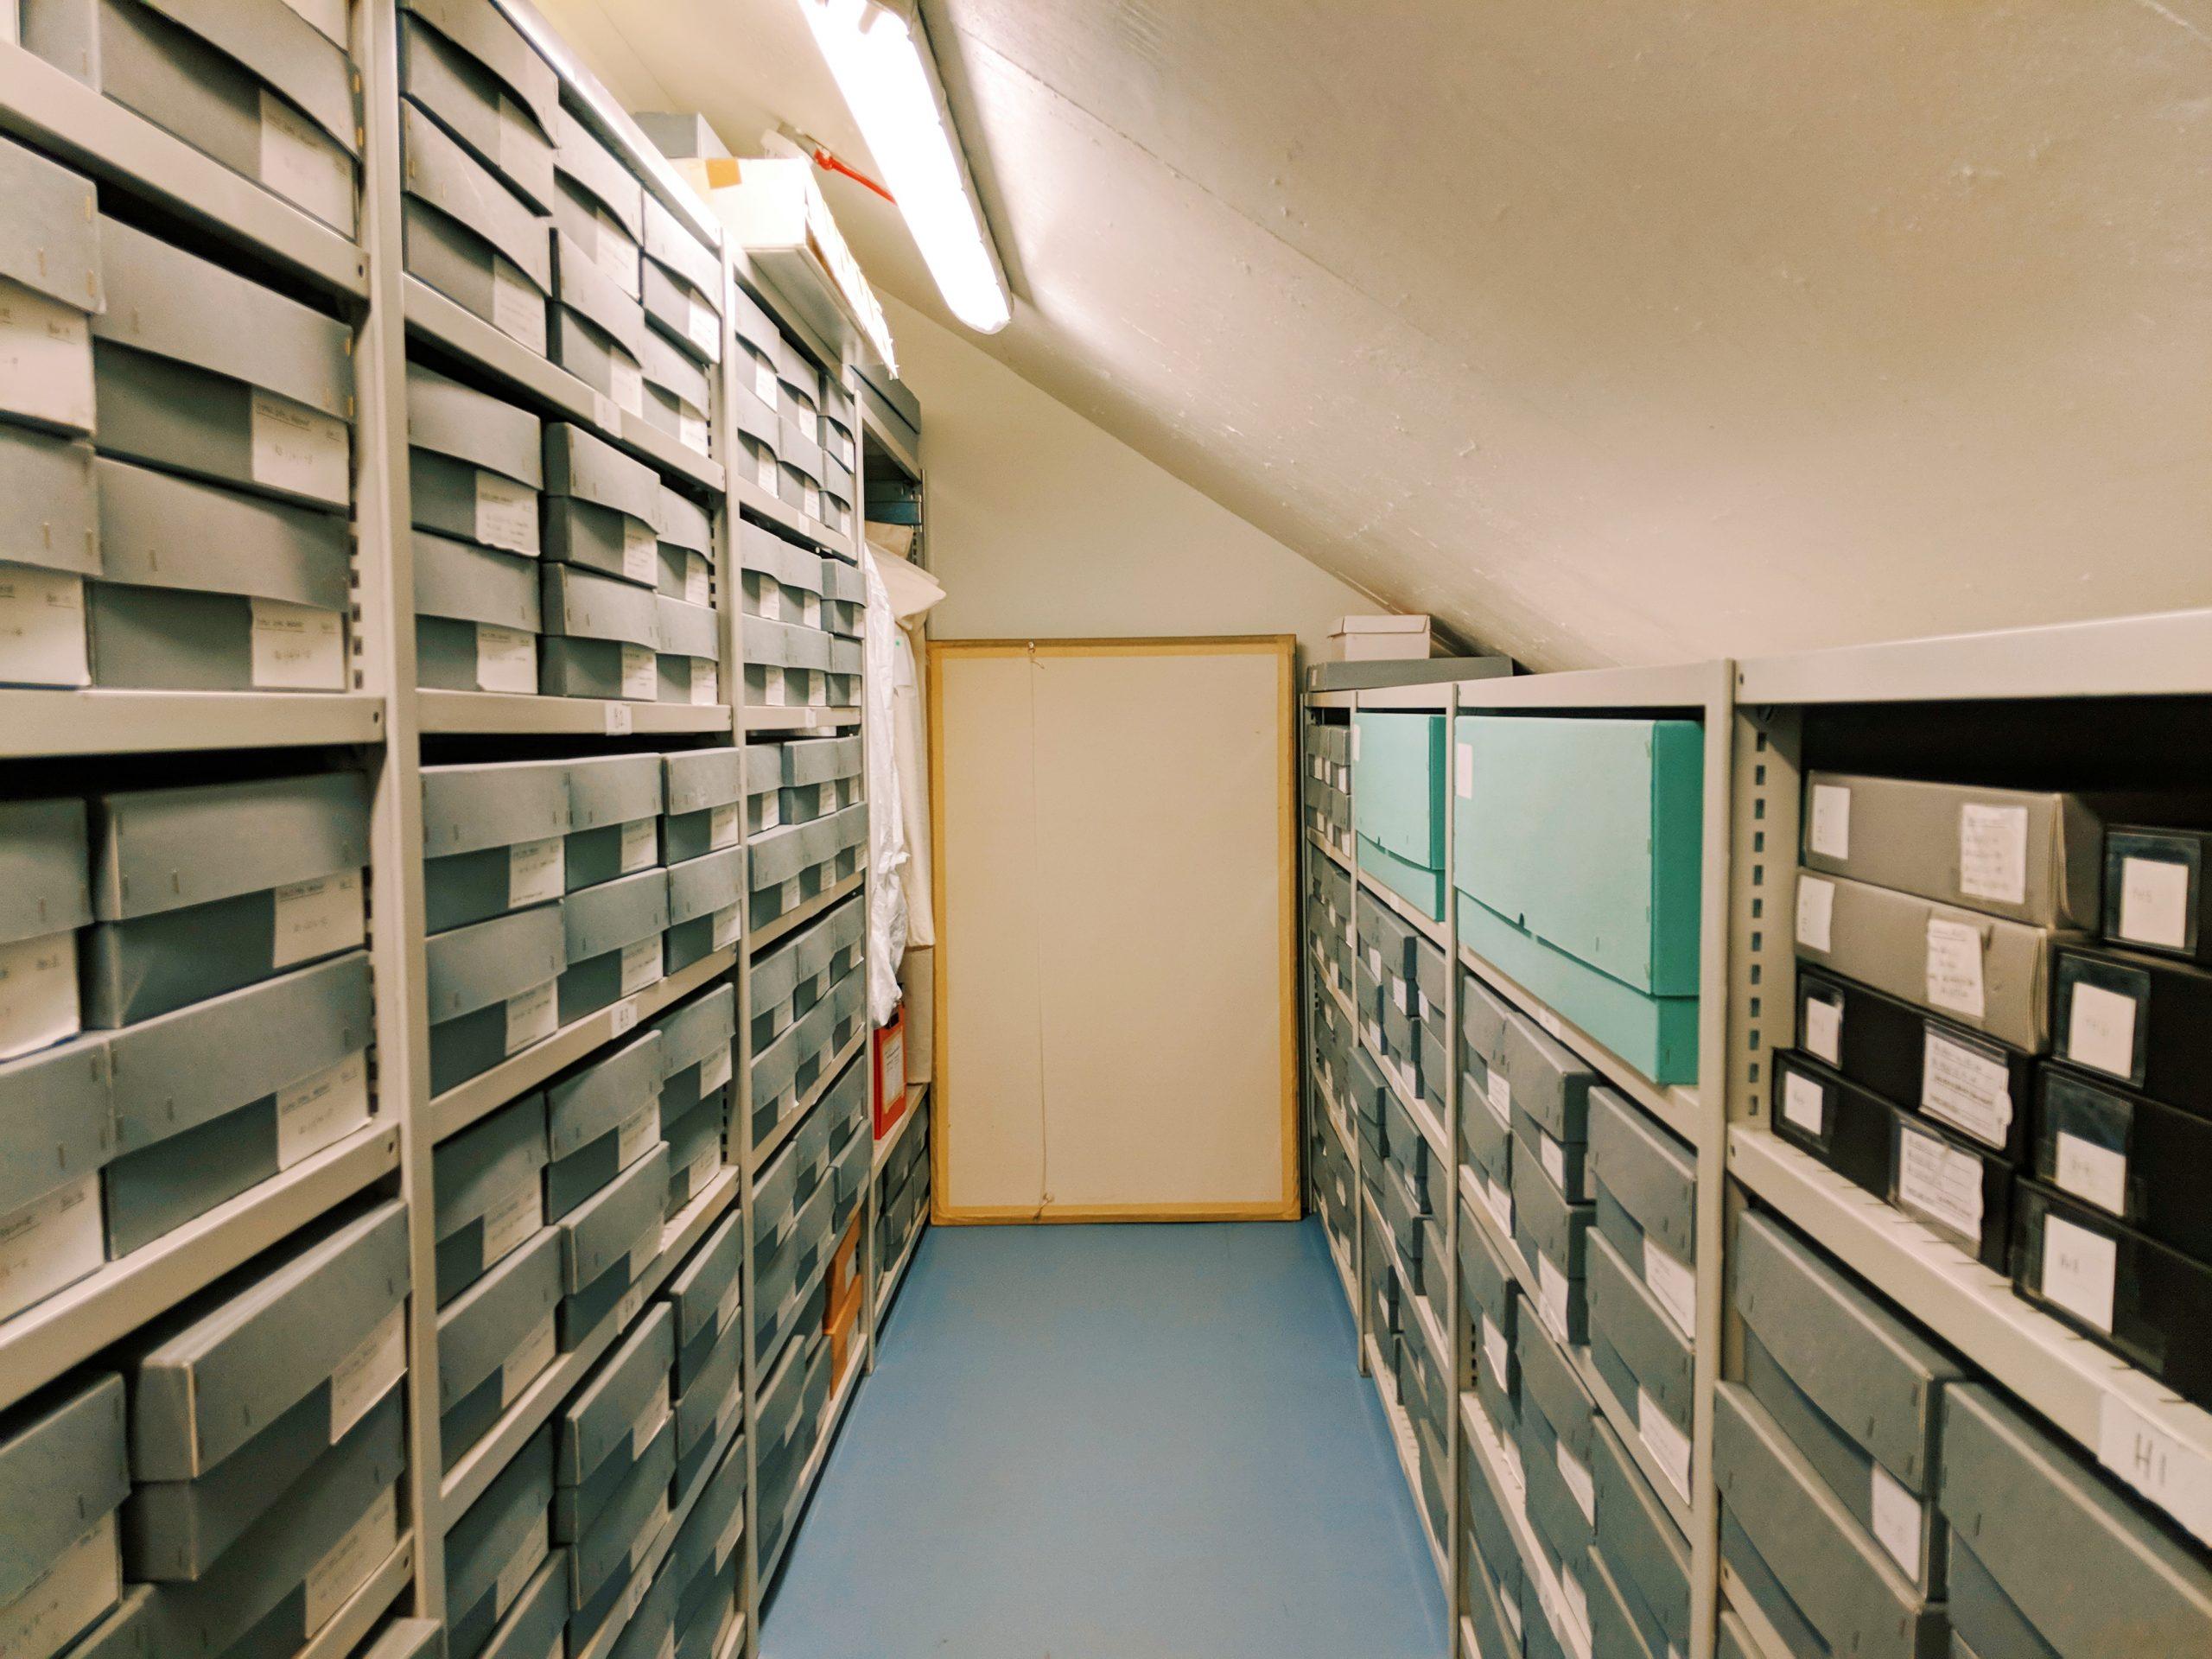 Roald Dahl Manuscript Archive